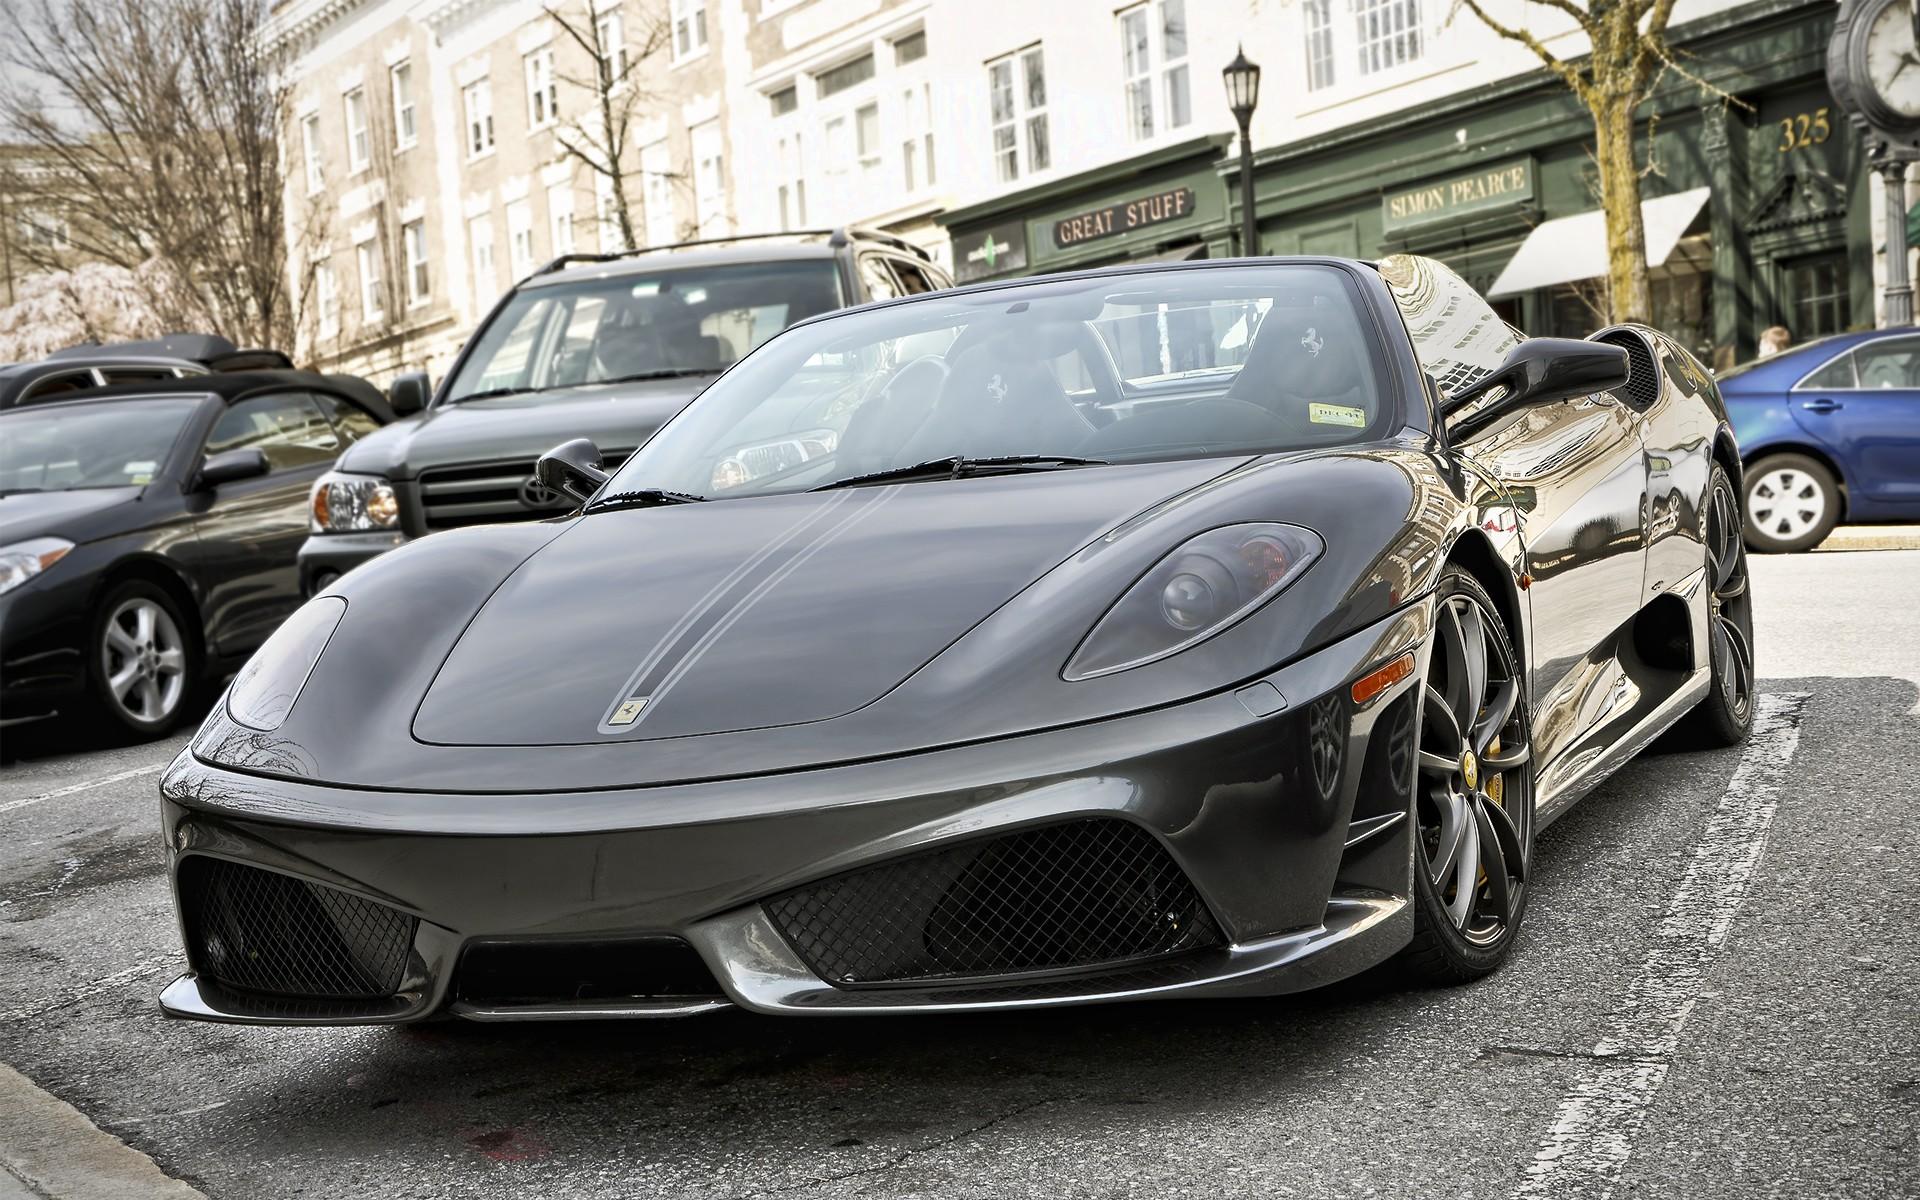 Black Ferrari F430 Scuderia